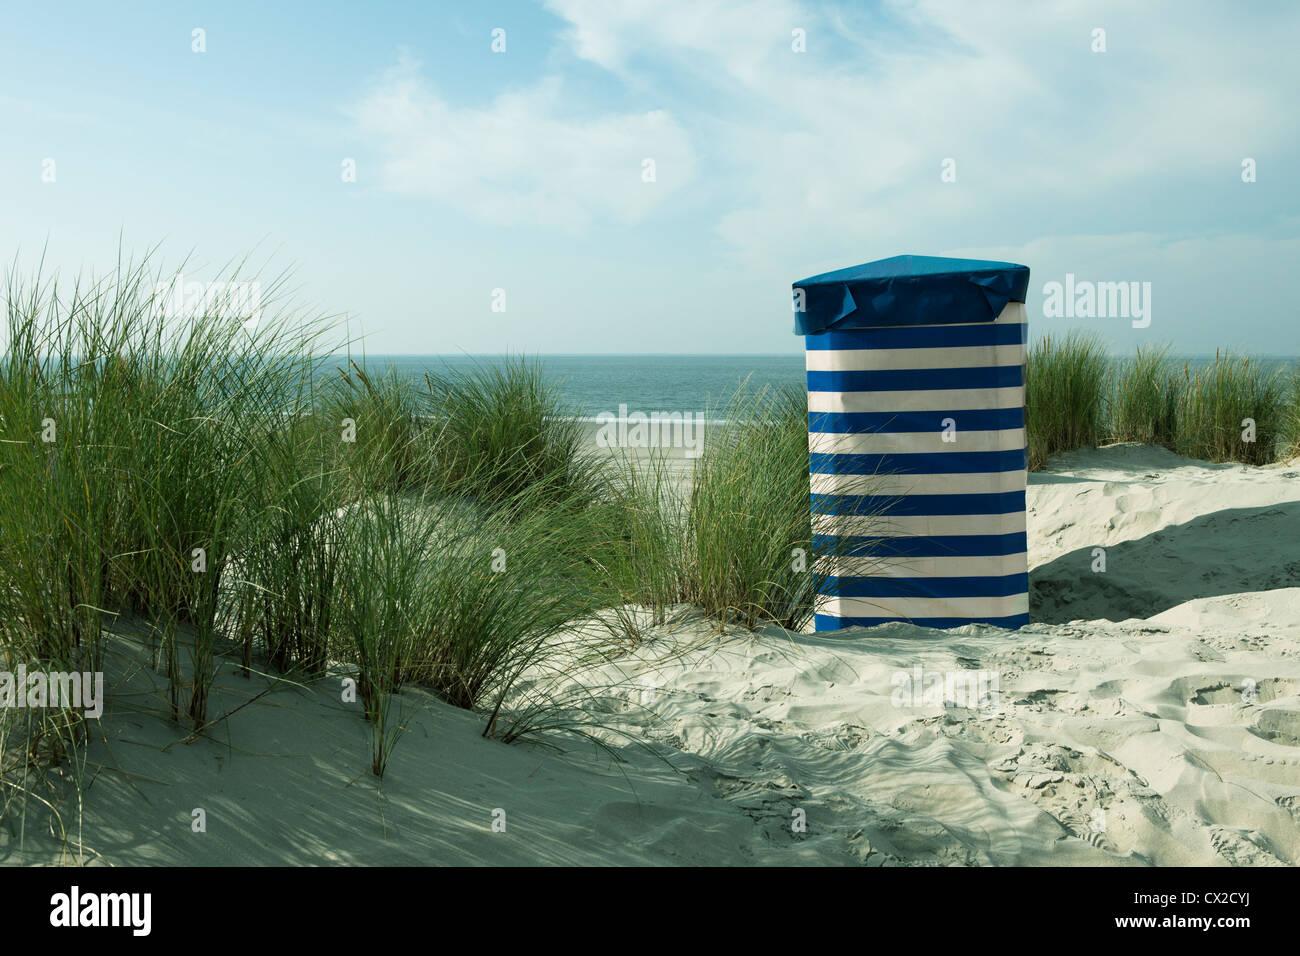 Beach, Borkum, Germany, dune, nature, sky, clouds, dune landscape, relax, island, north sea, summertime, tourism, - Stock Image